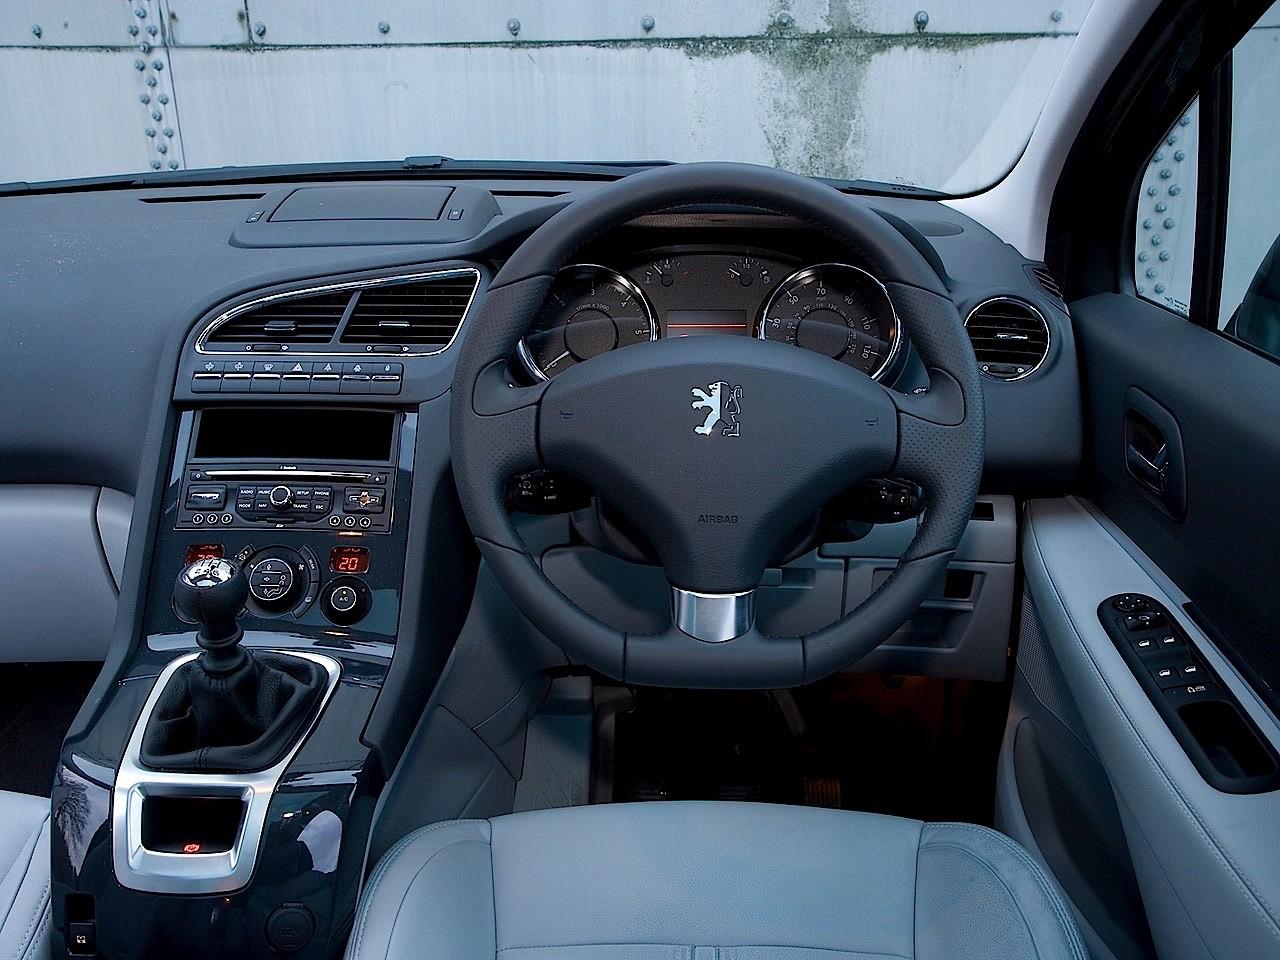 Peugeot 5008 Interior >> PEUGEOT 5008 - 2009, 2010, 2011, 2012, 2013 - autoevolution